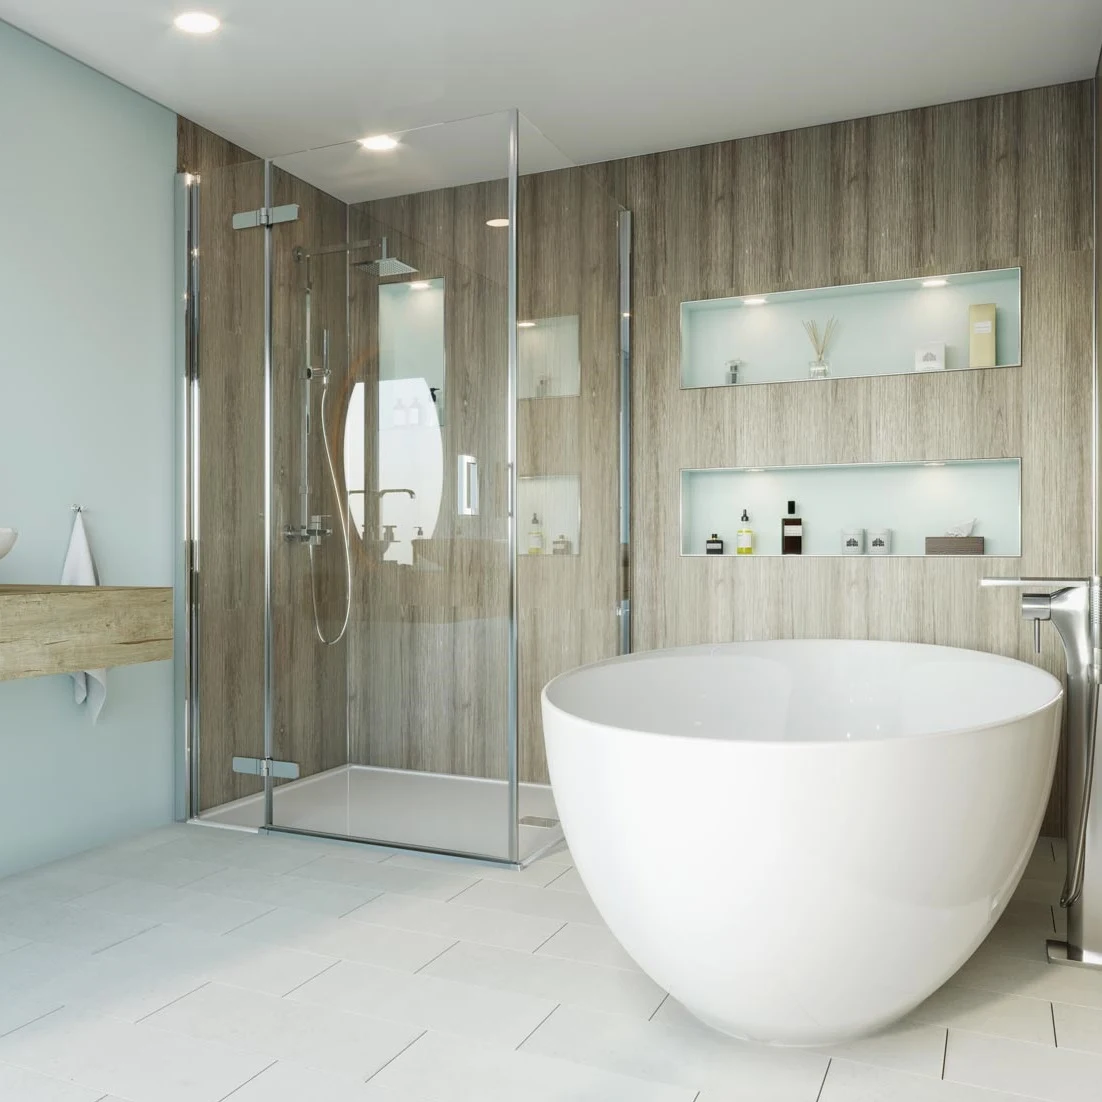 Multipanel Click Premier Floor Tiles White Diamond 1 8m2 Bathroom Wall Panels Flooring Stunning Interiors